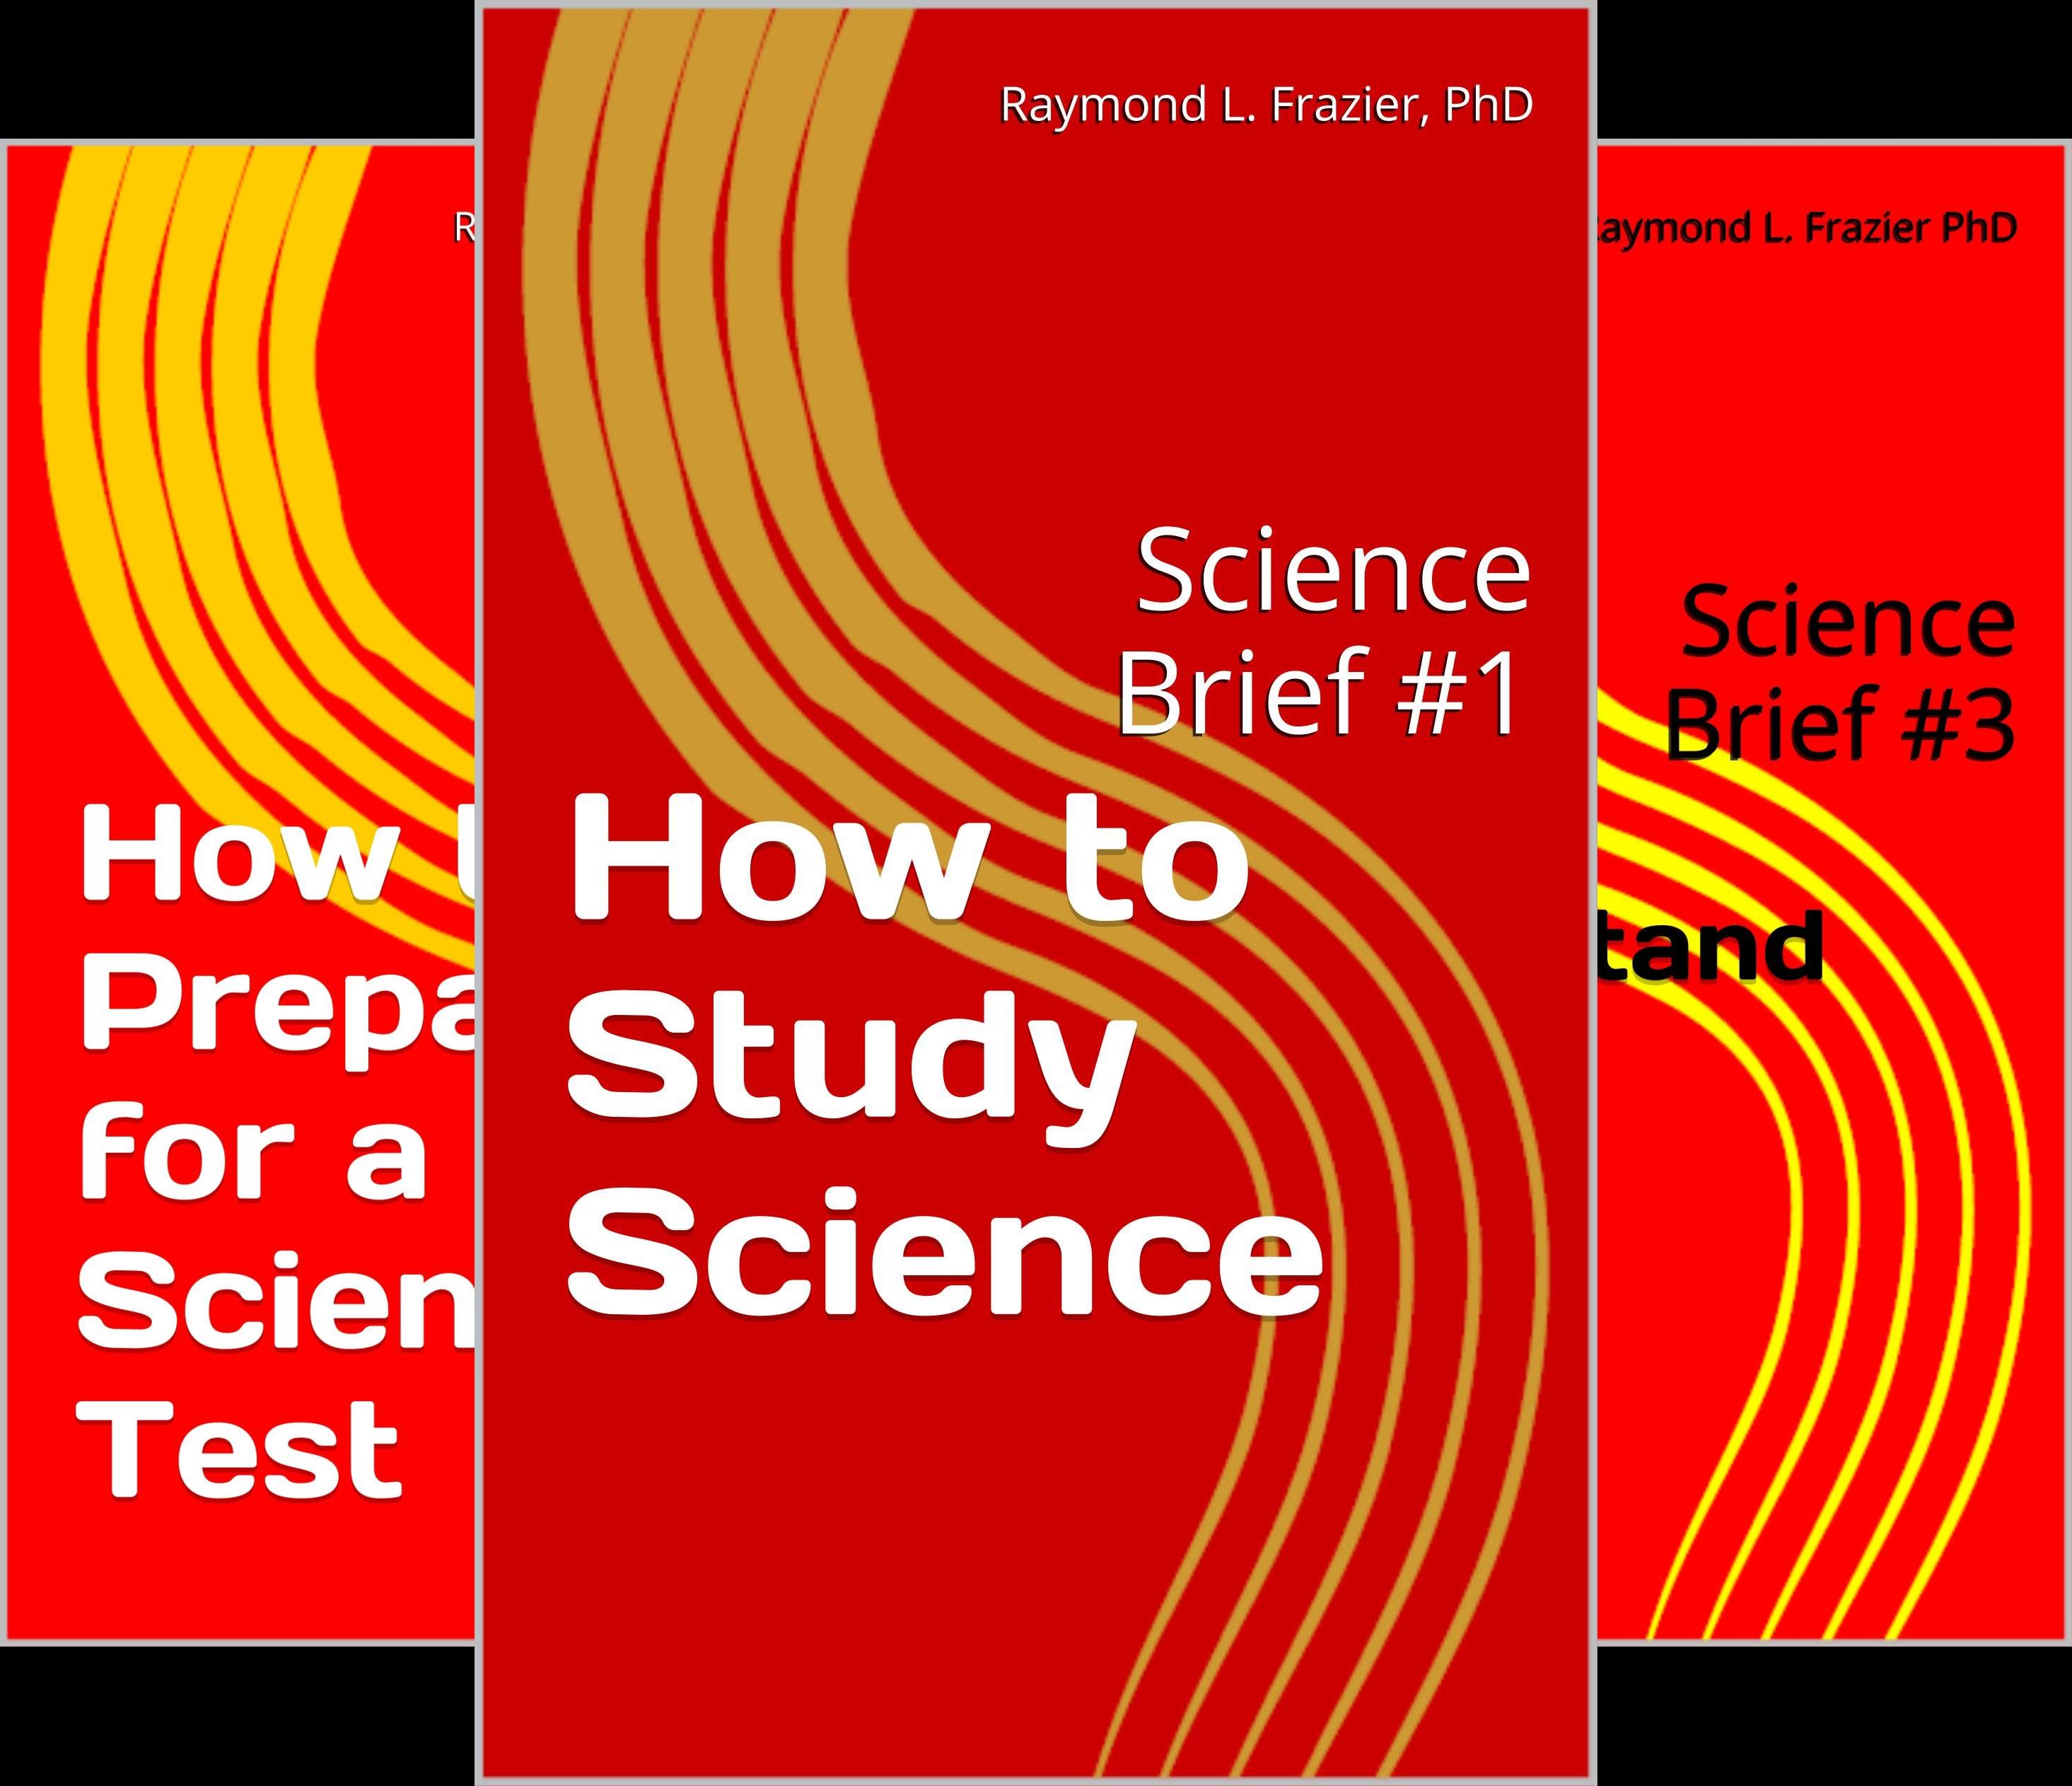 Science Briefs (15 Book Series)